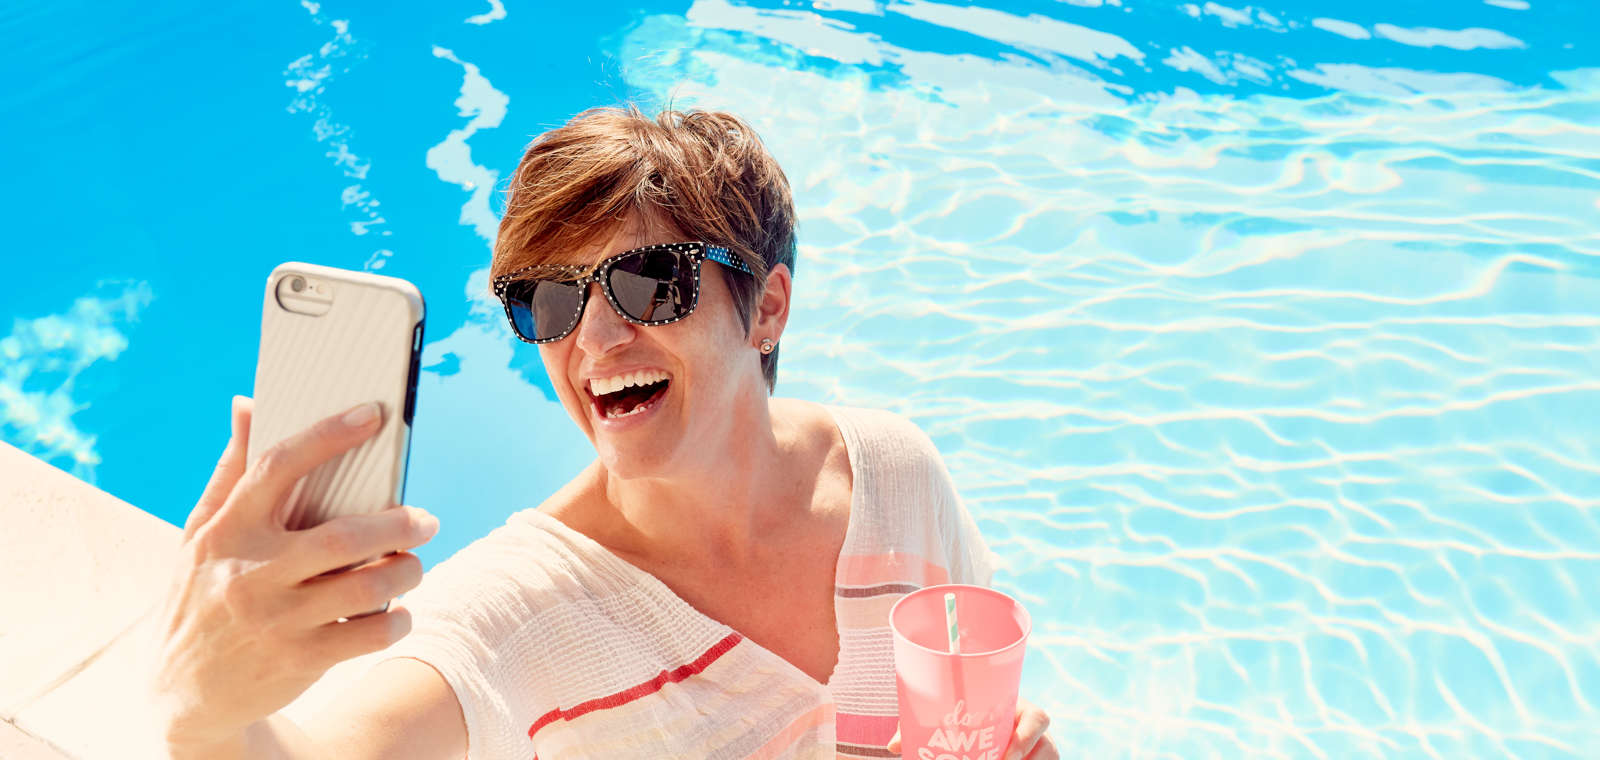 Woman Taking Selfie By Pool